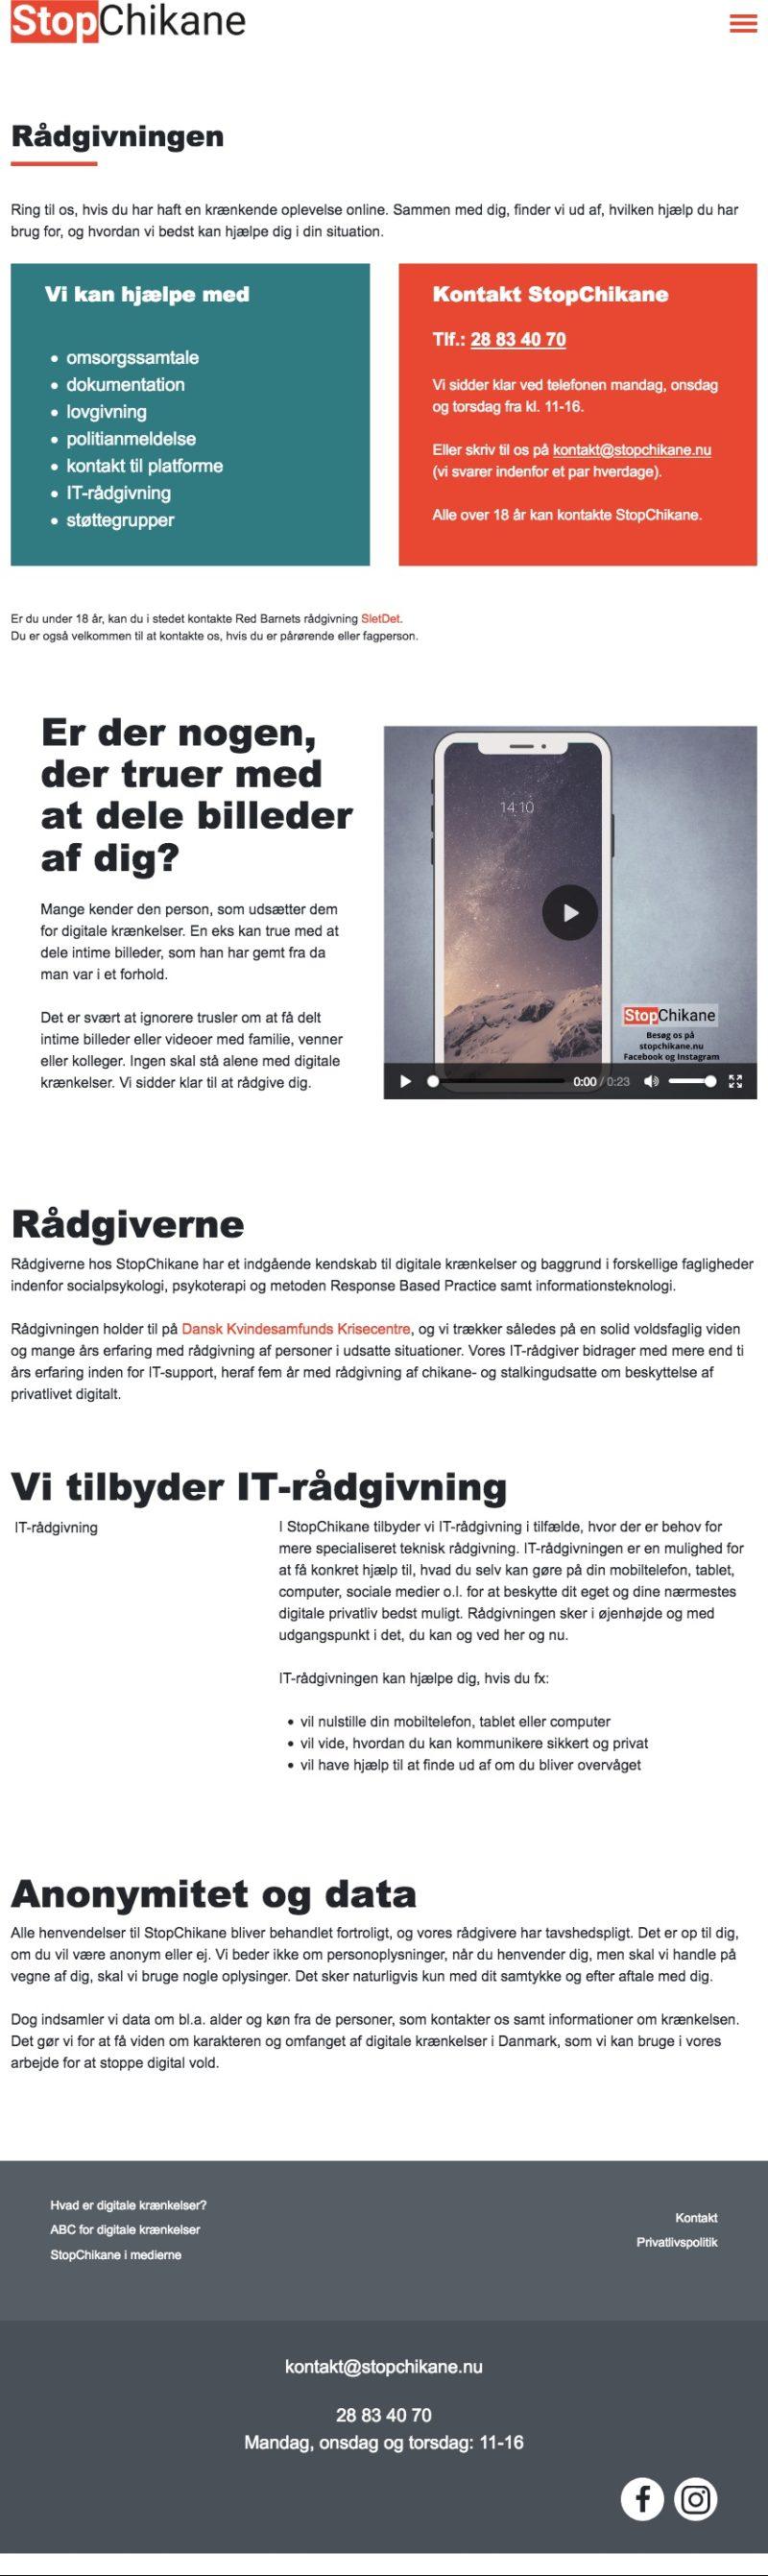 stopchikane.nu - screenshot tablet